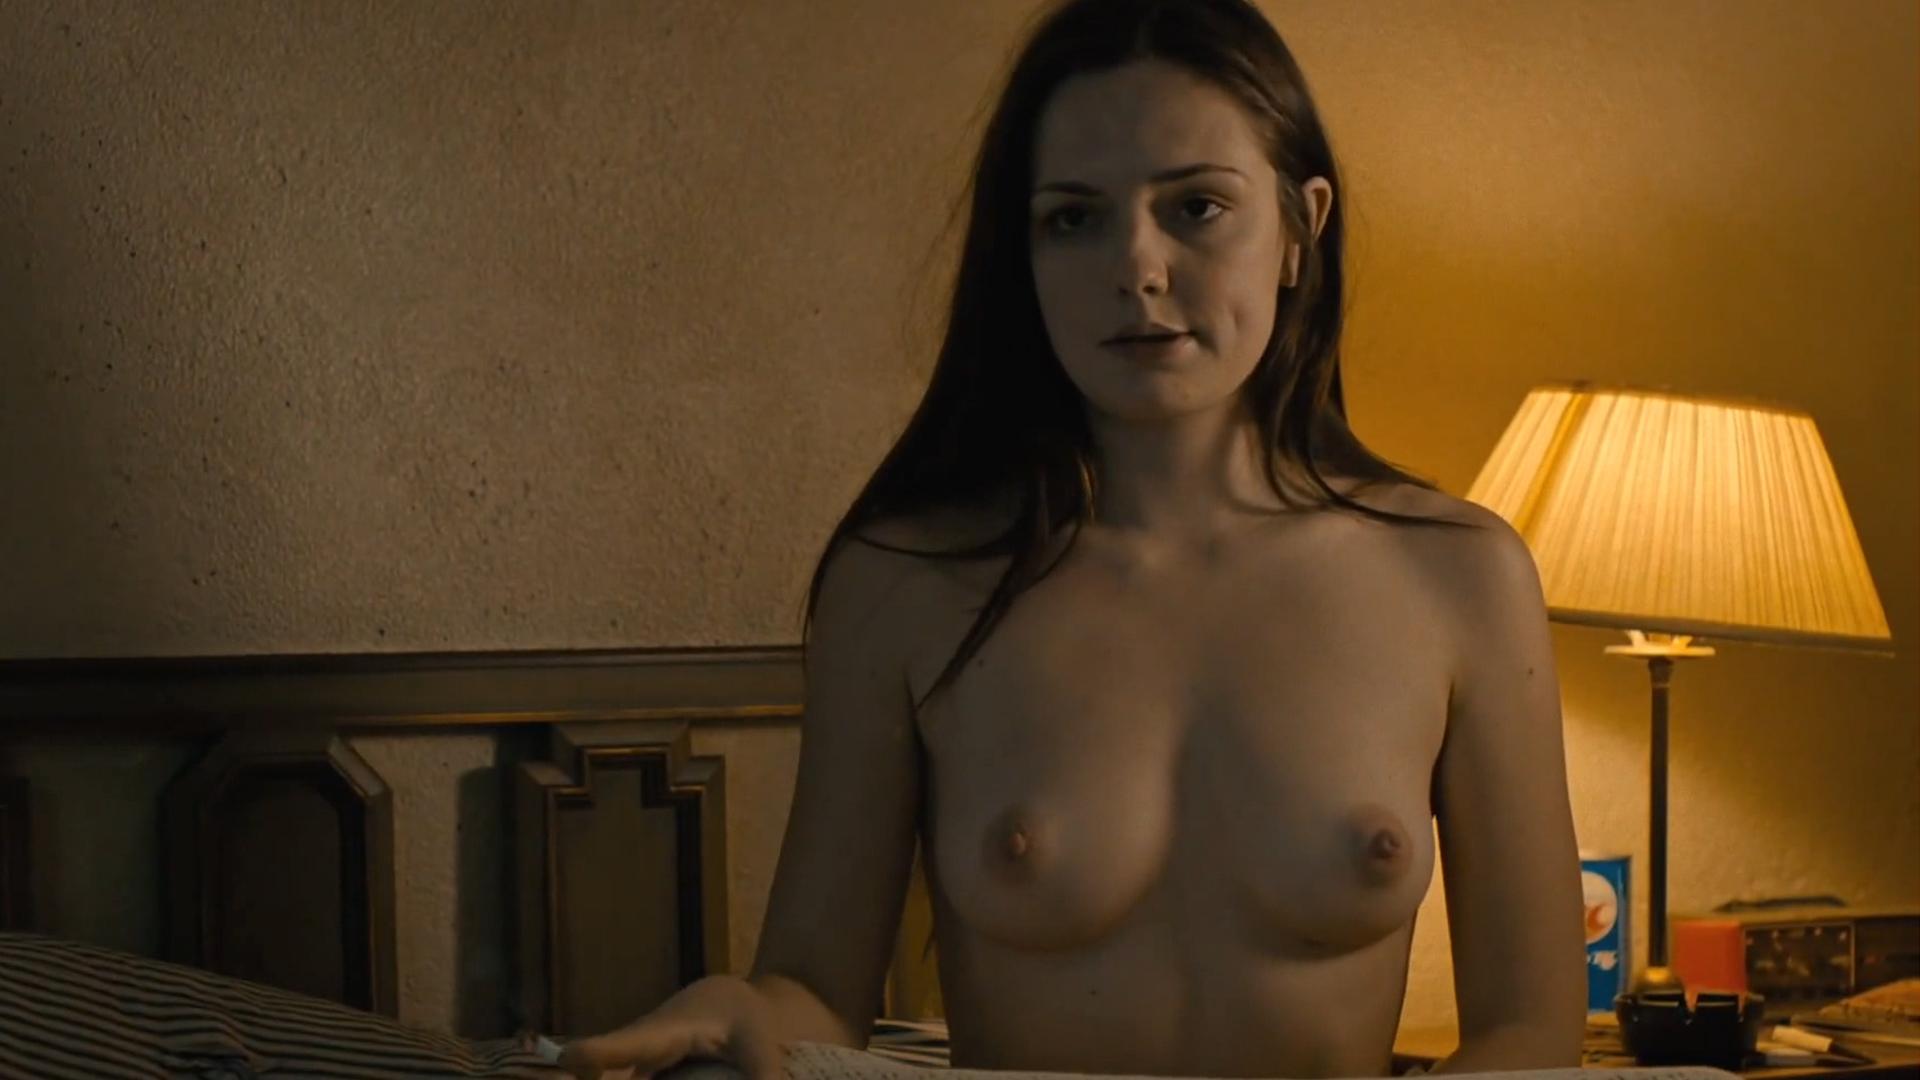 Nude y accident